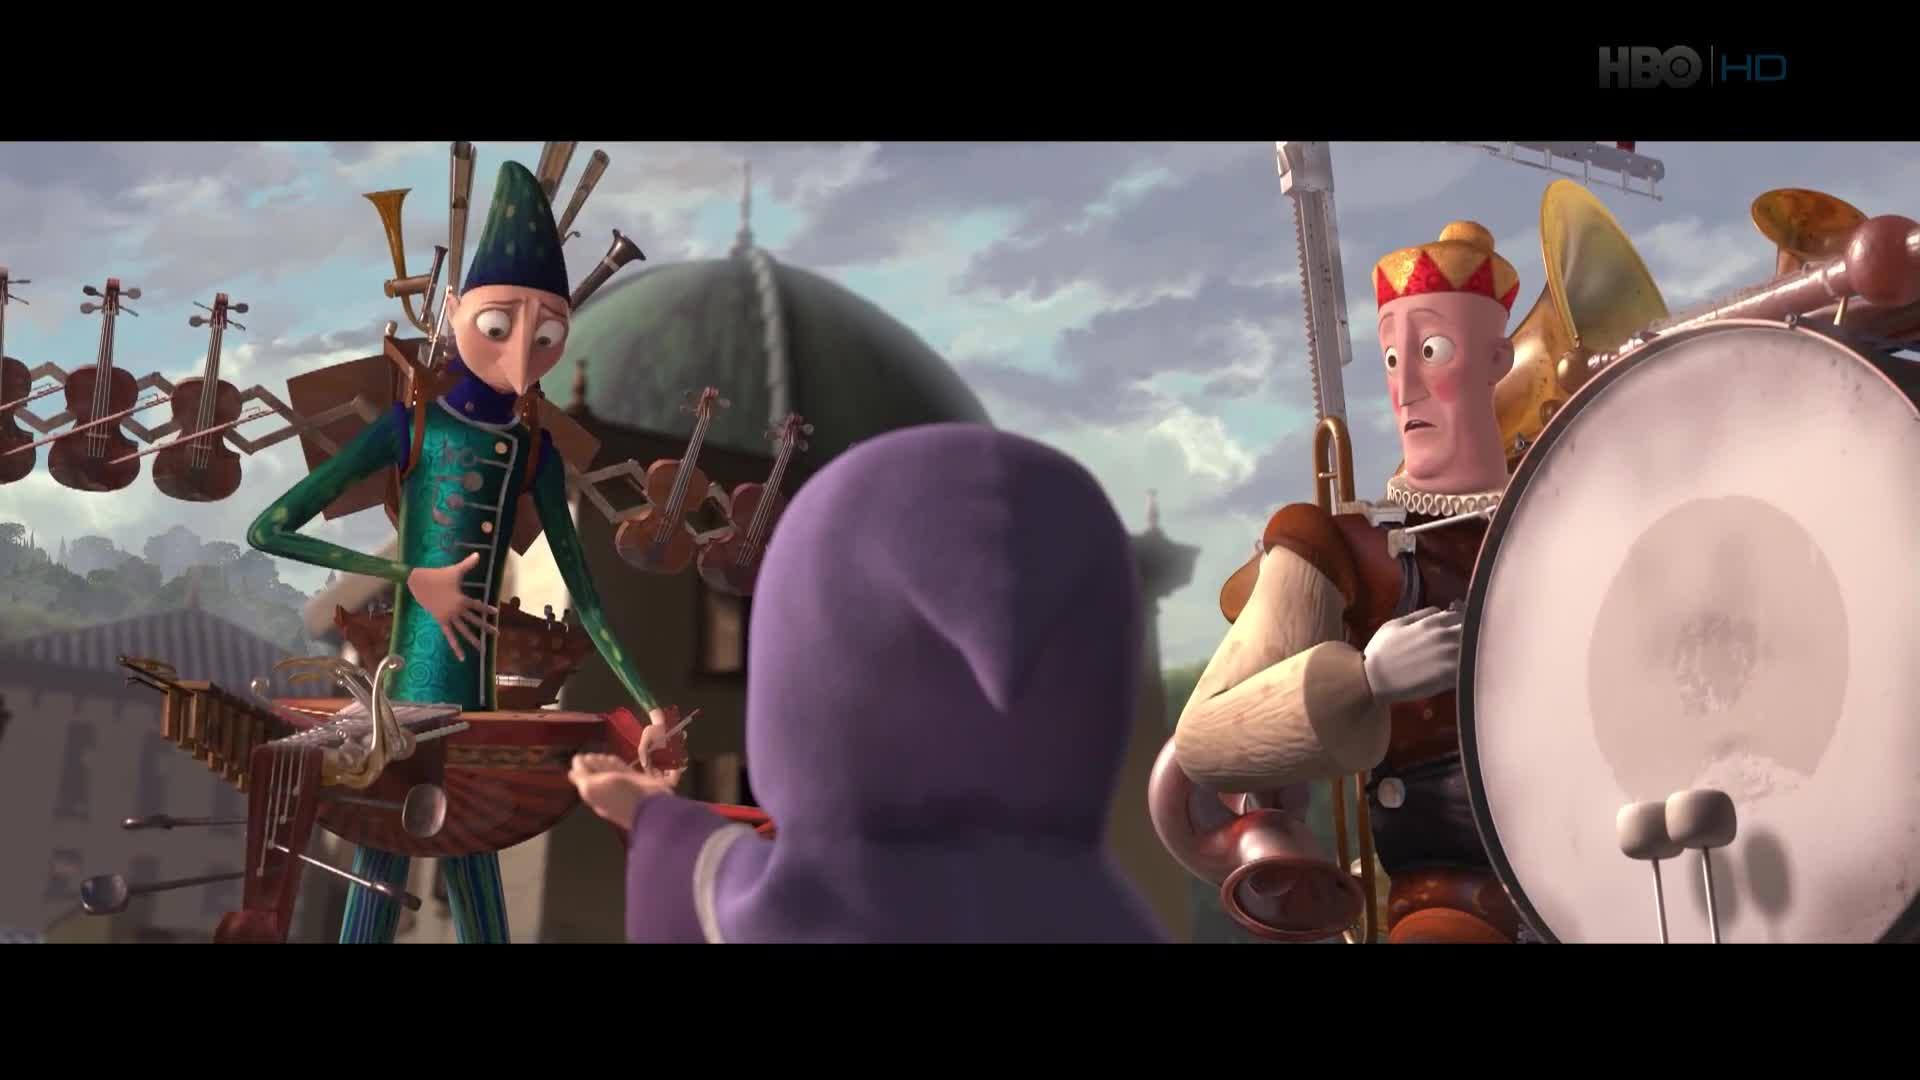 Disneyho kratke animovane filmy 3    2015  HD cz